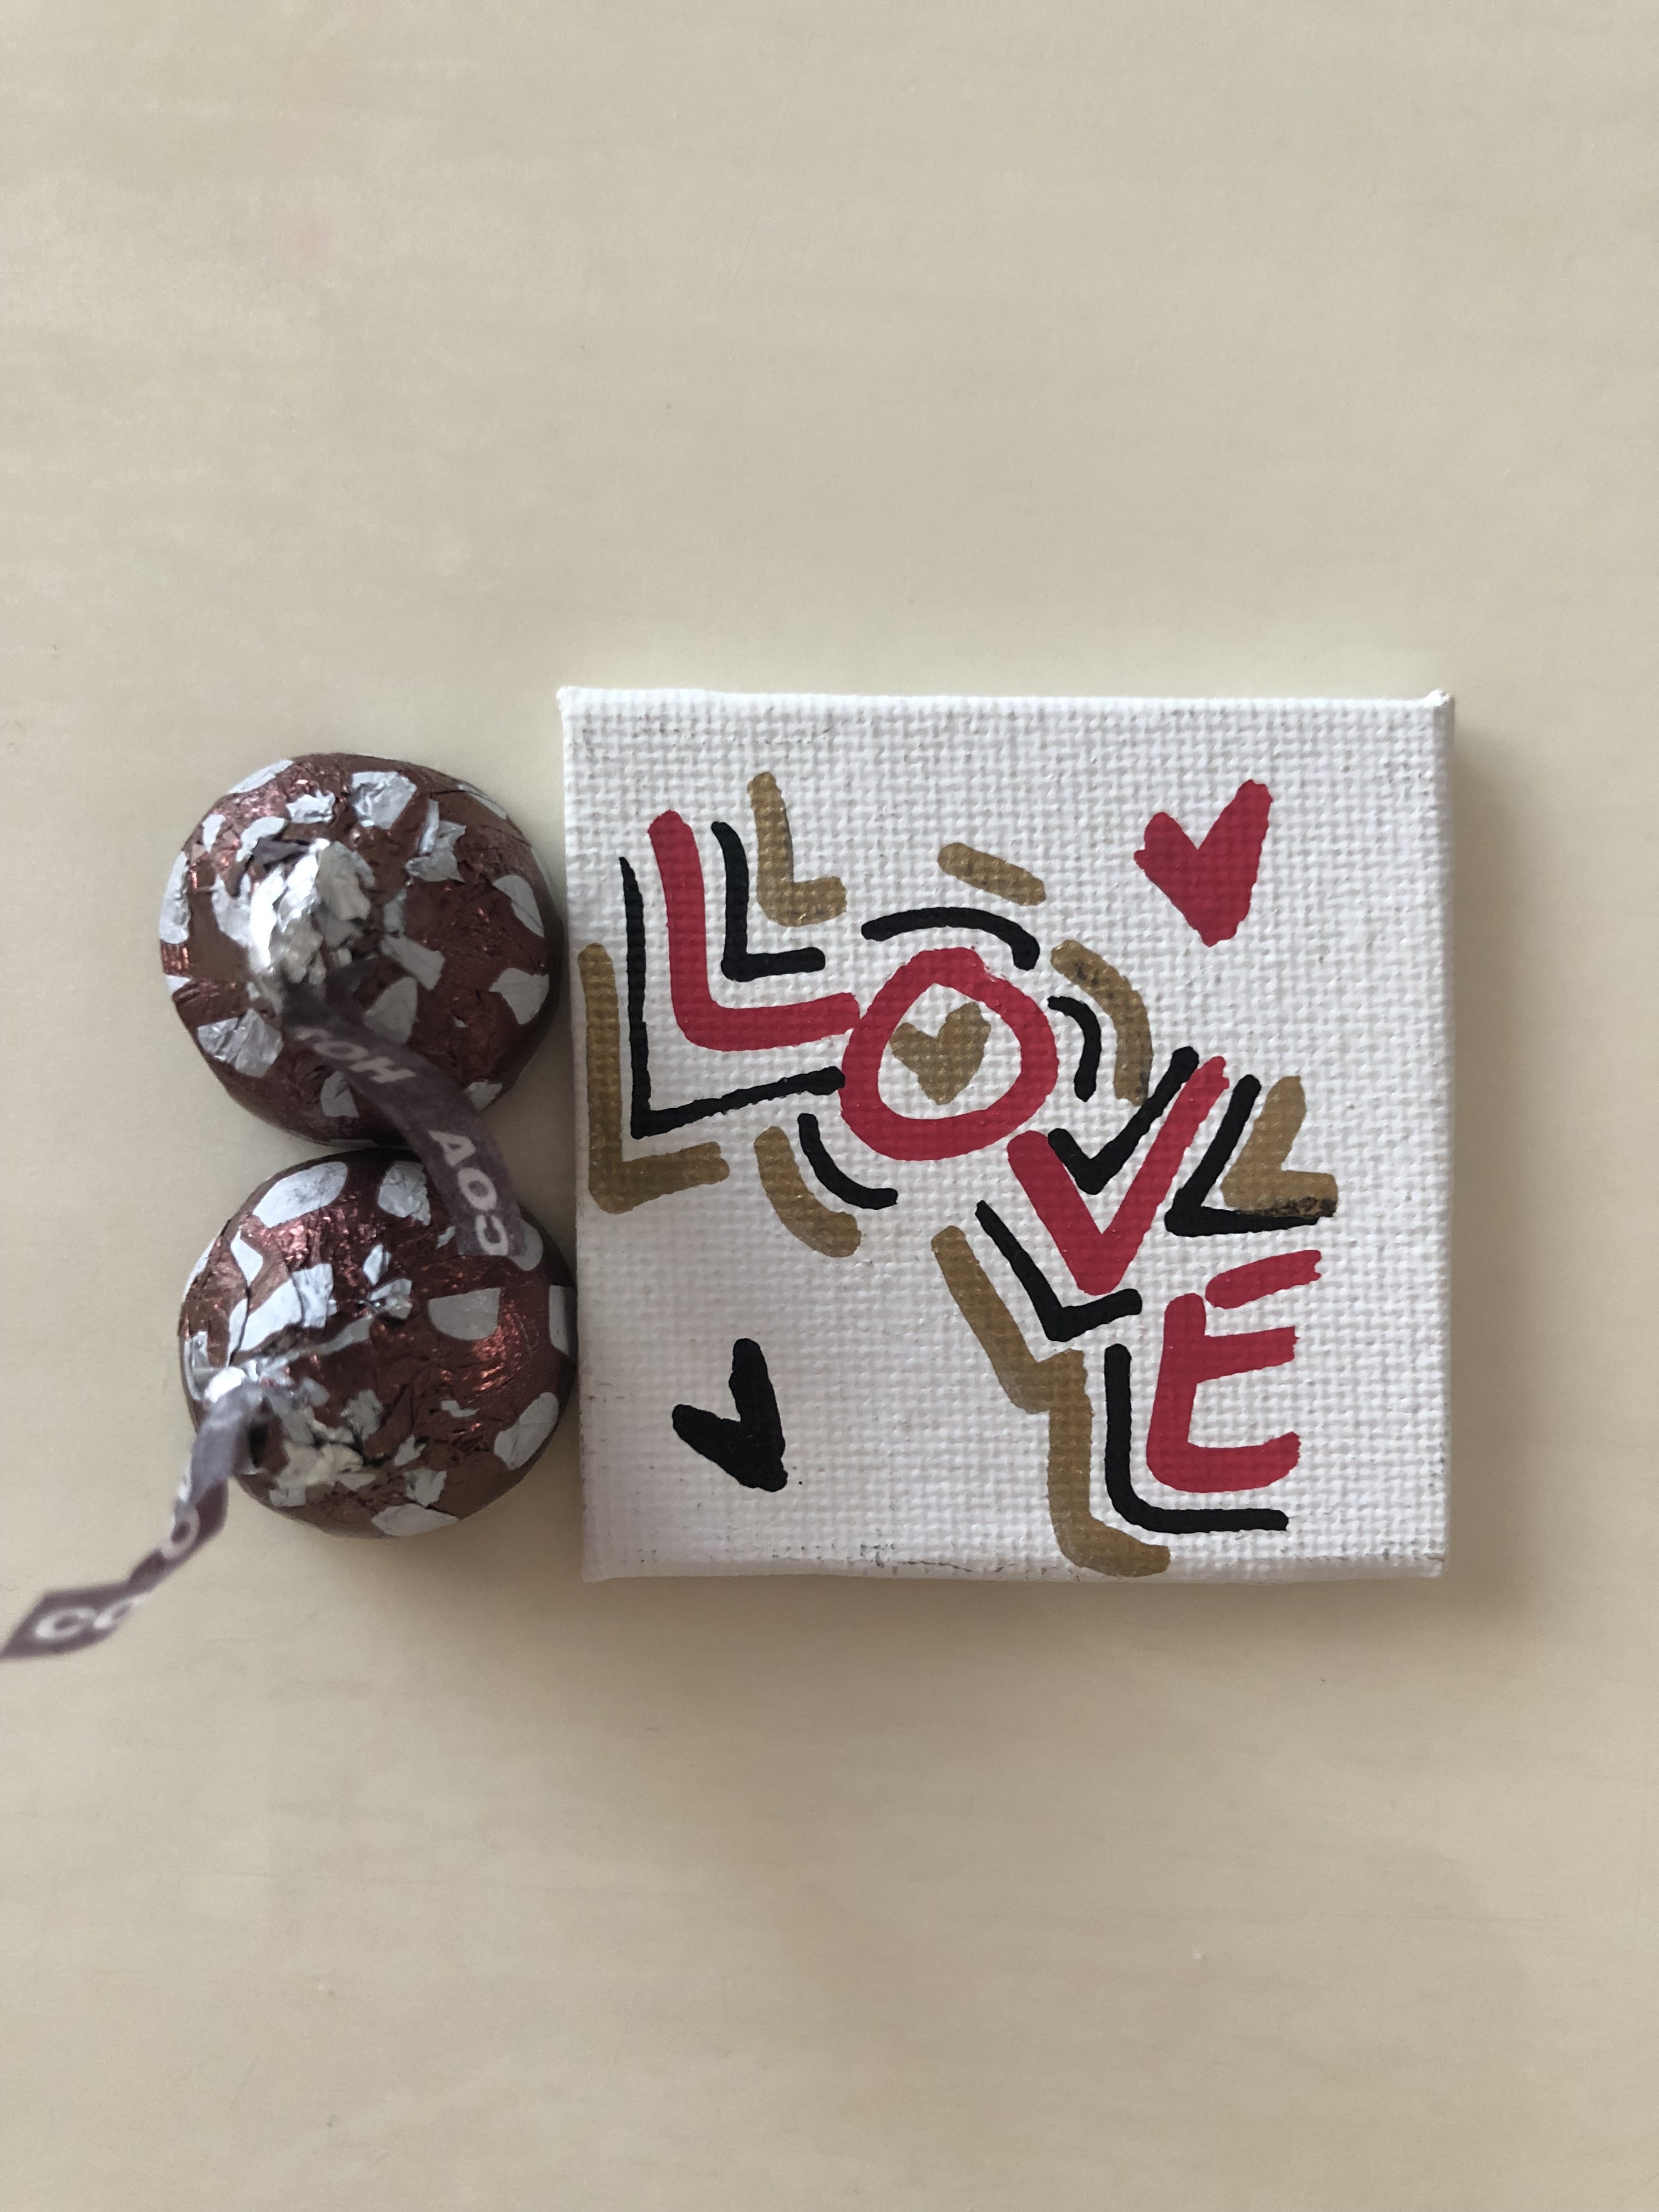 L O V E - Spells LOVE